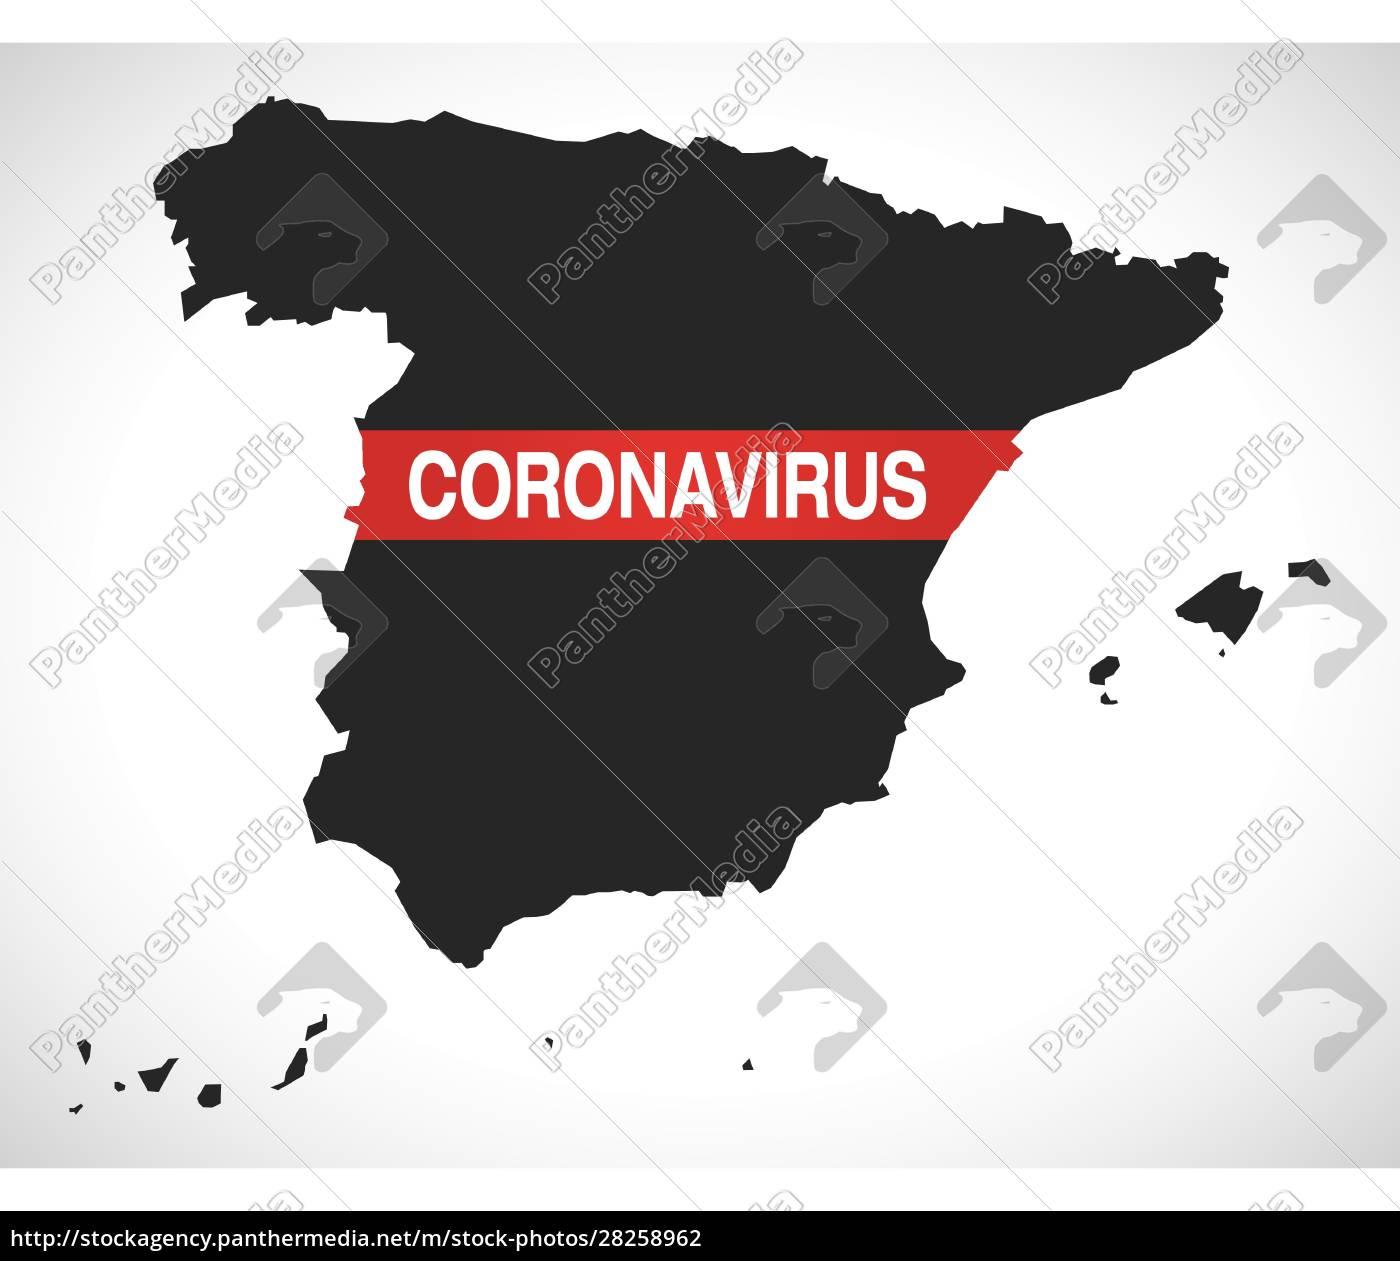 spain, map, with, coronavirus, warning, illustration - 28258962